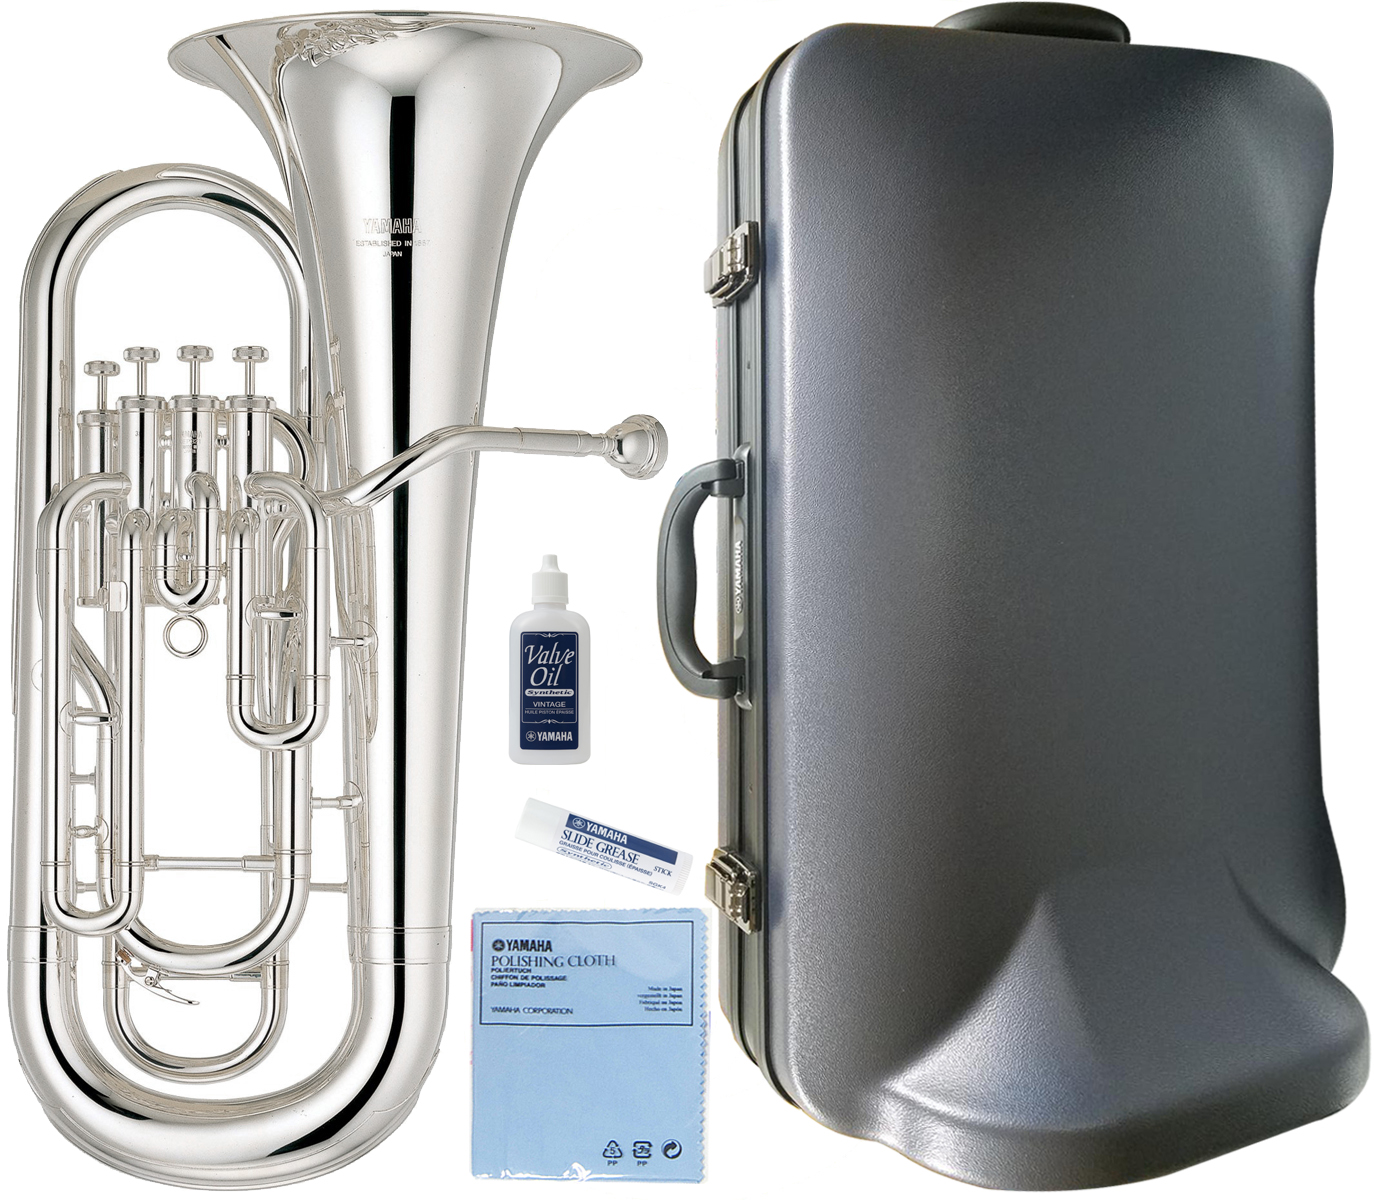 YAMAHA ( ヤマハ ) YEP-321S ユーフォニアム 4ピストン トップアクション 銀メッキ 本体 日本製 管楽器 シルバーメッキ Euphonium YEP321S 一部送料追加 送料無料